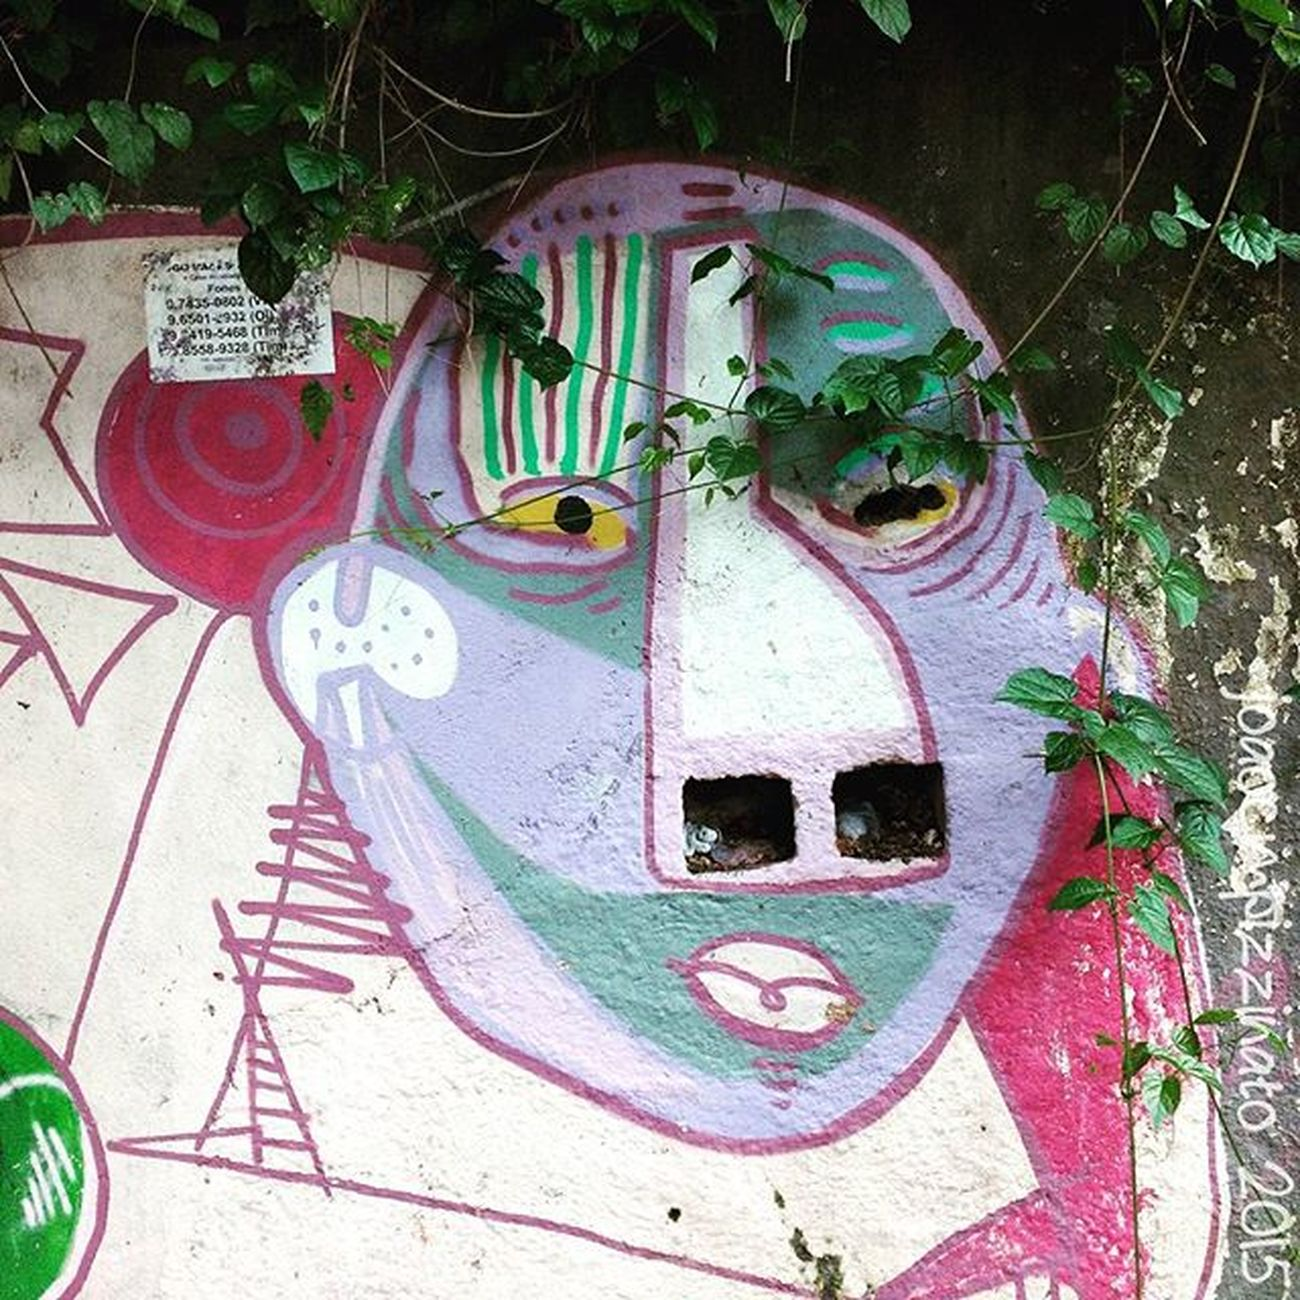 Art by @_akbo Graffiti Graffitiart Art Streetart UrbanART Streetphotography Urban Streetphoto_brasil Colors City Belavista Saopaulo Brasil Photograph Photography Flaming_abstracts Mundoruasp Olhonaruasp